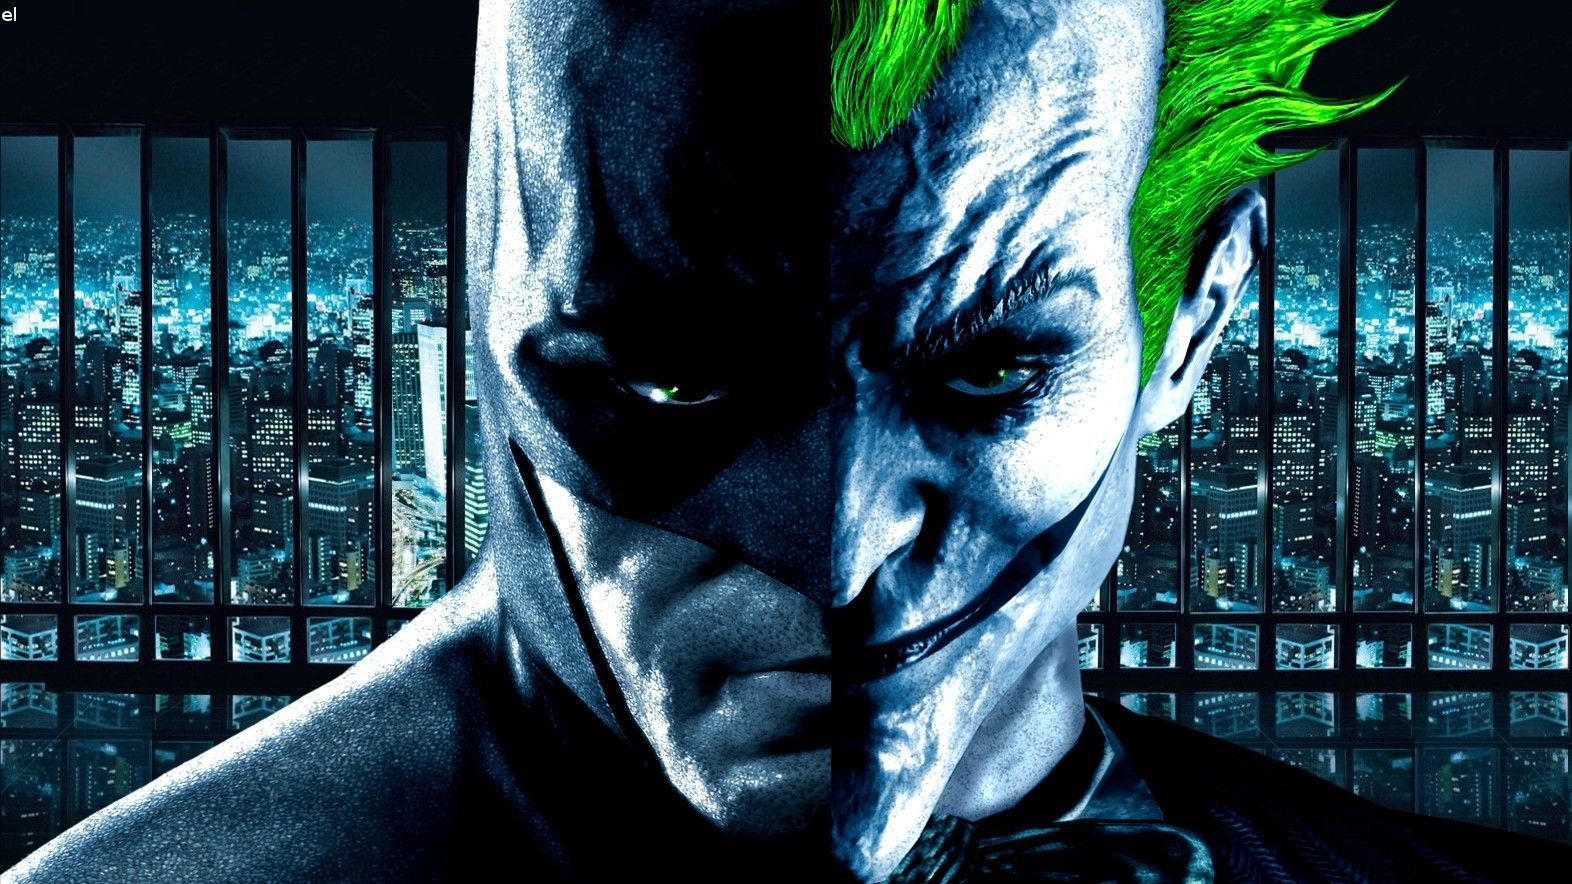 Batman And Joker Wallpapers - Wallpaper Cave